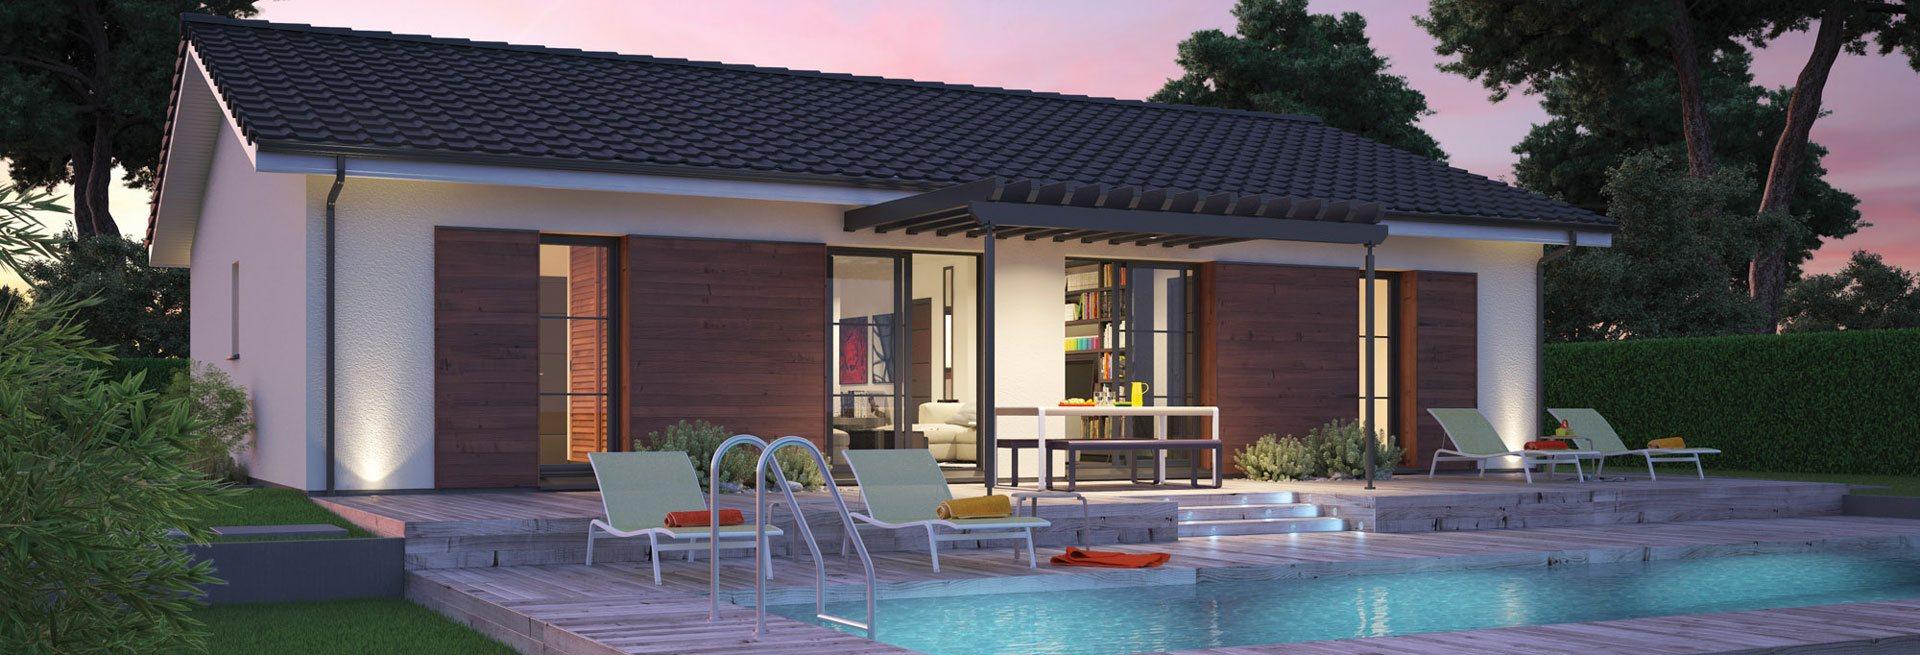 Model de villa basse for Modele villa